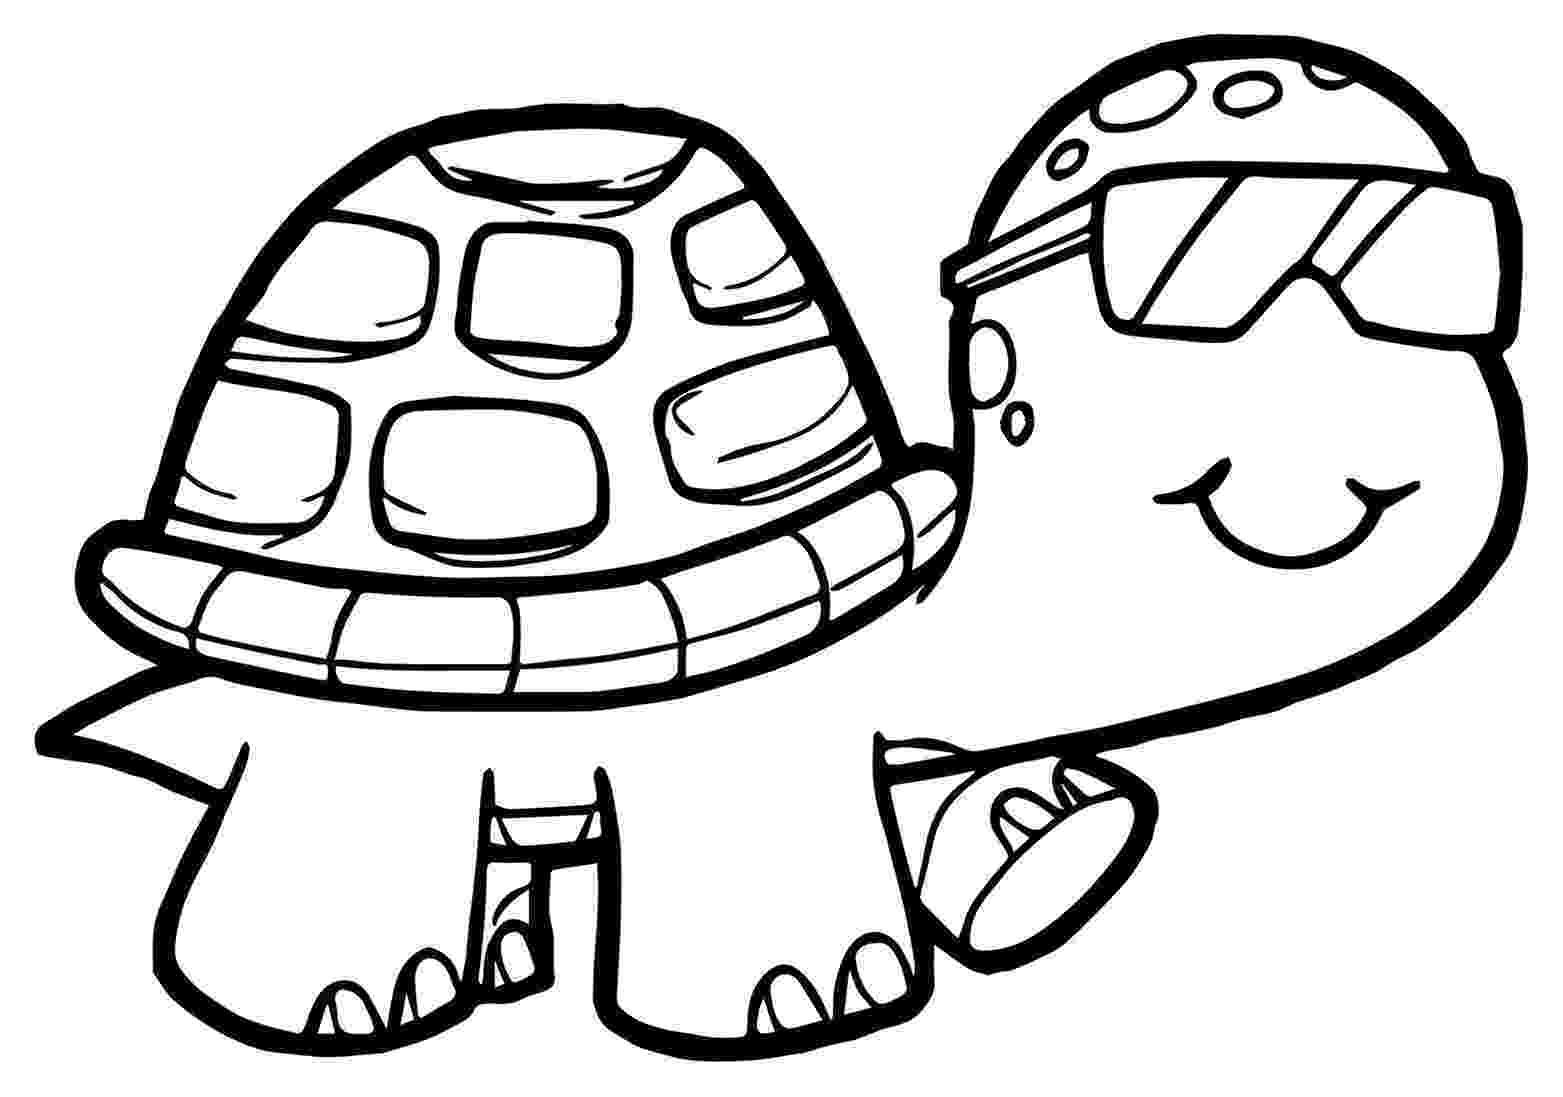 turtle coloring book ninja turtles coloring pages free download best ninja coloring turtle book